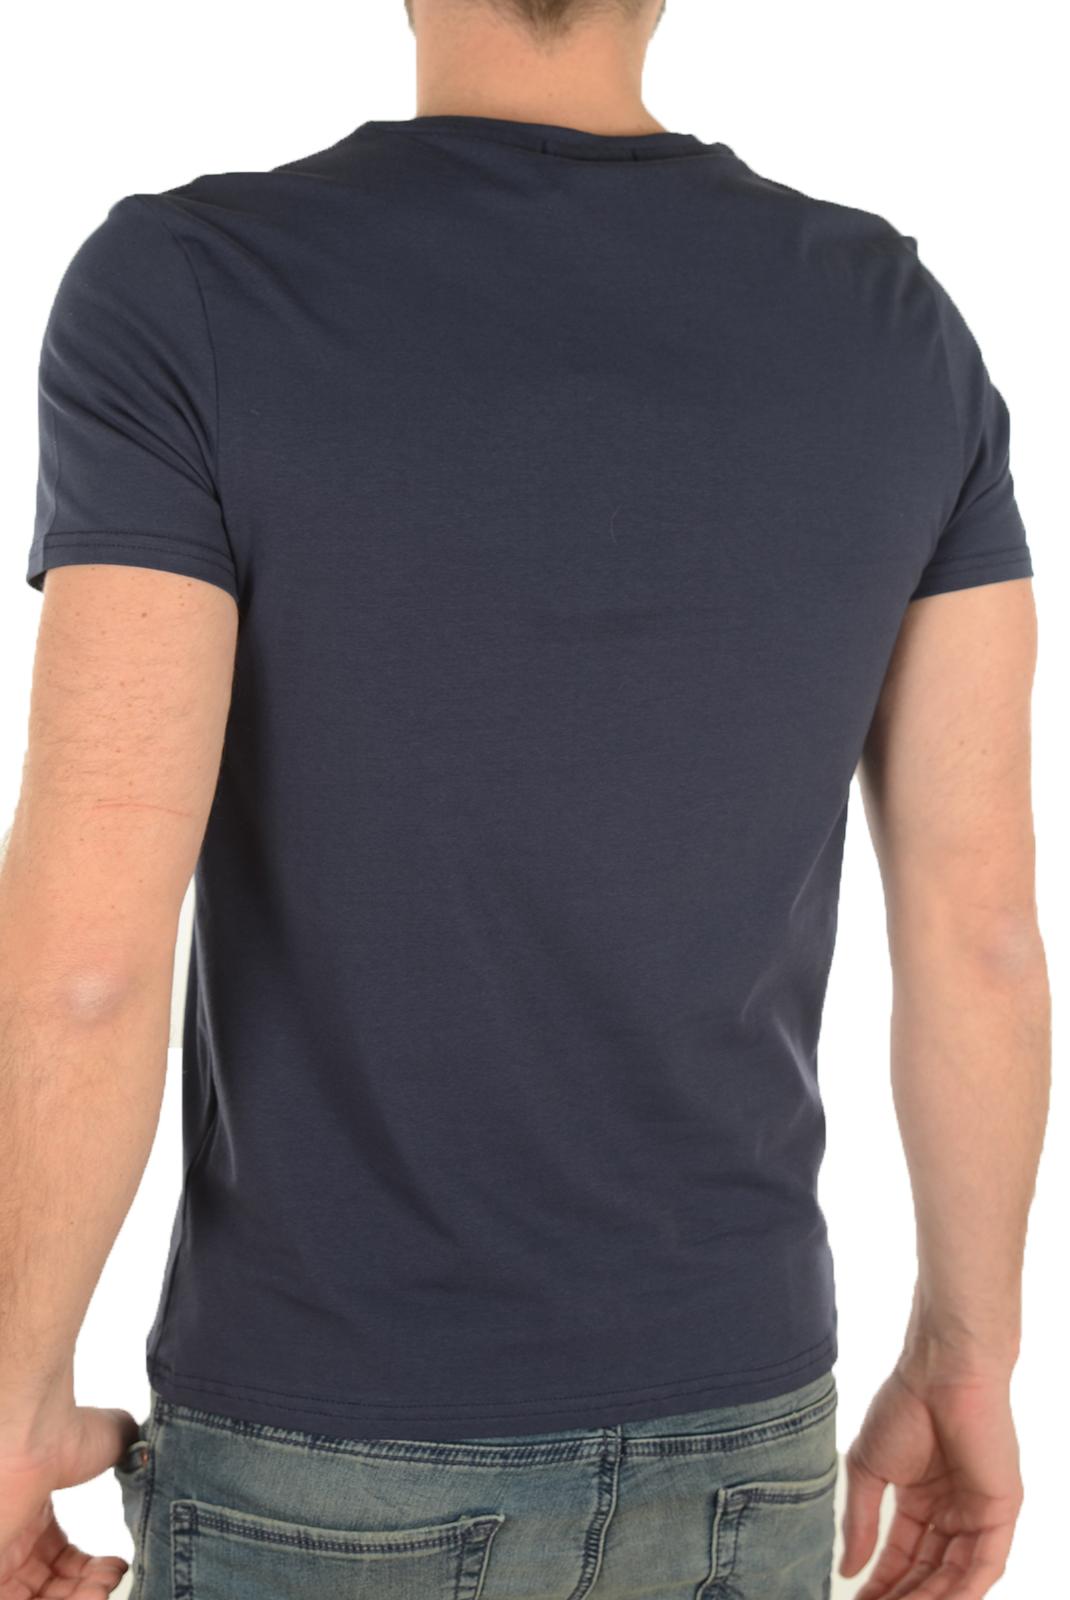 Tee-shirts manches courtes  Redskins SOFTBALL 2 CALDER H16 DARK NAVY